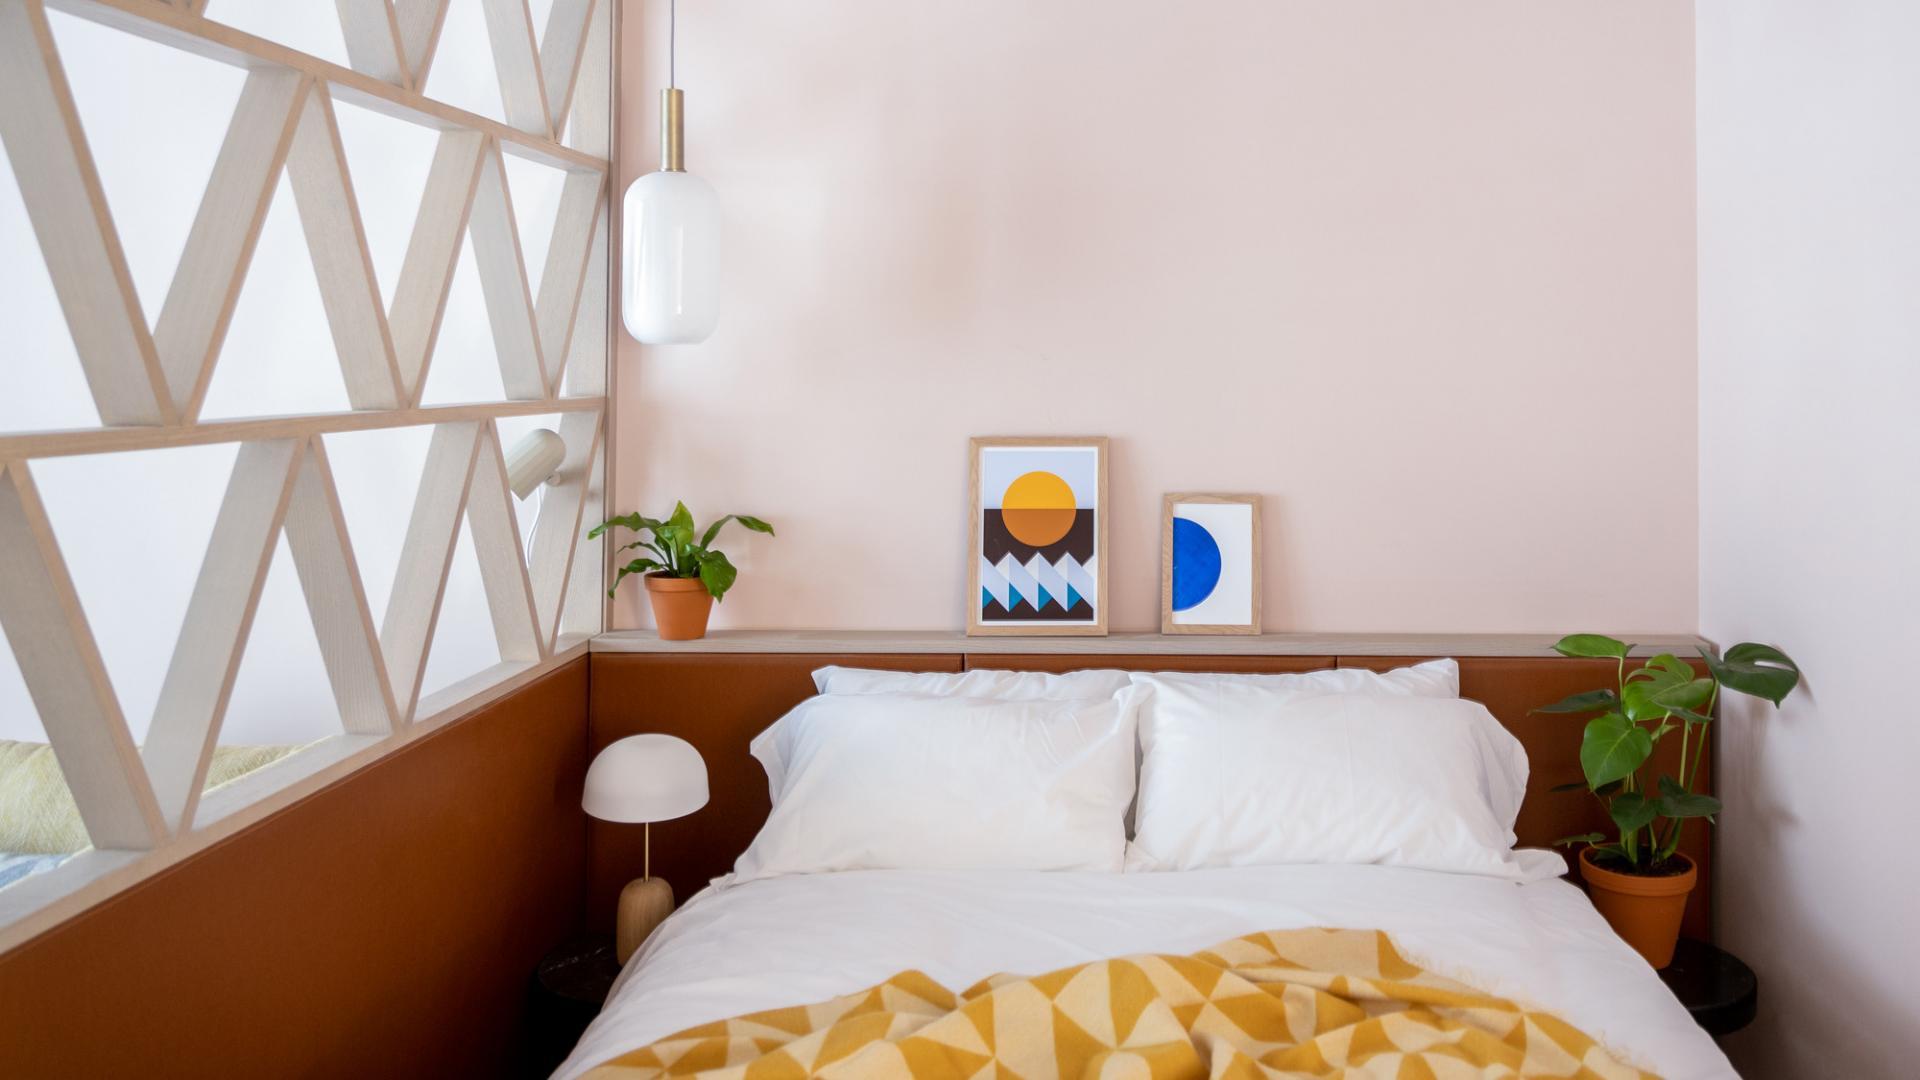 King size bed at Zanzibar Locke Apartments, Centre, Dublin